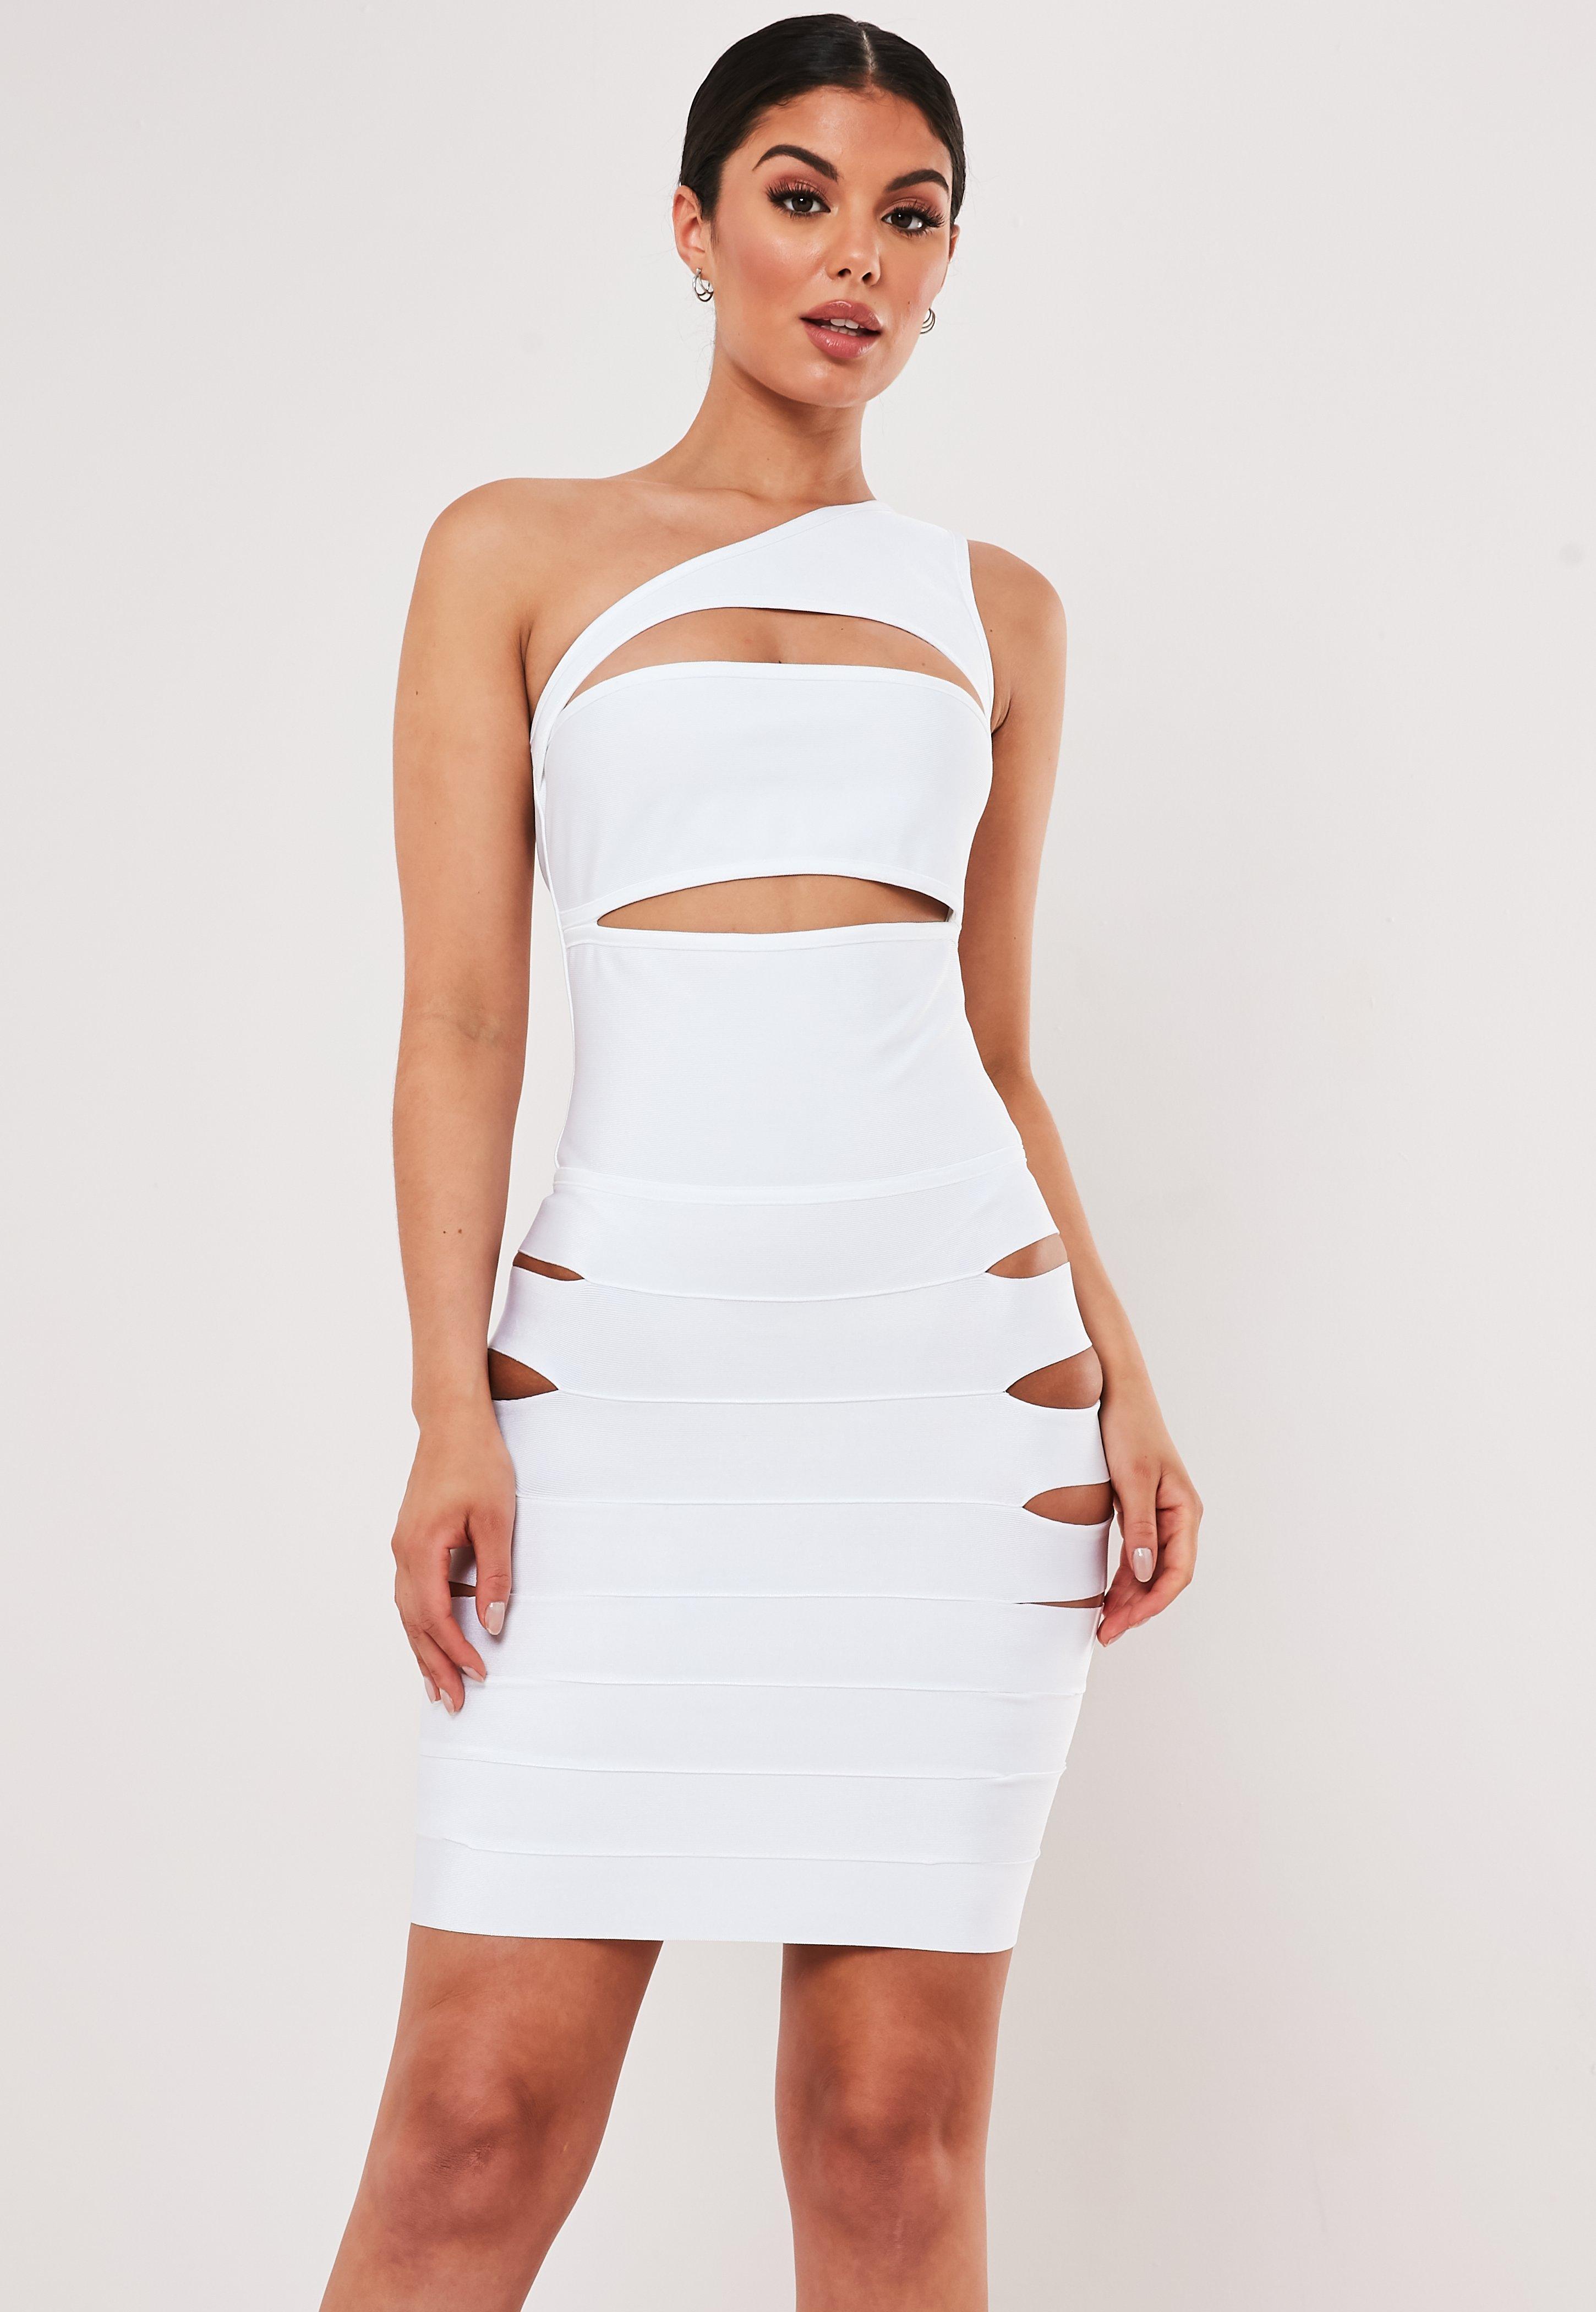 6639aa8deef4 Premium White Bandage One Shoulder Cut Out Mini Dress | Missguided